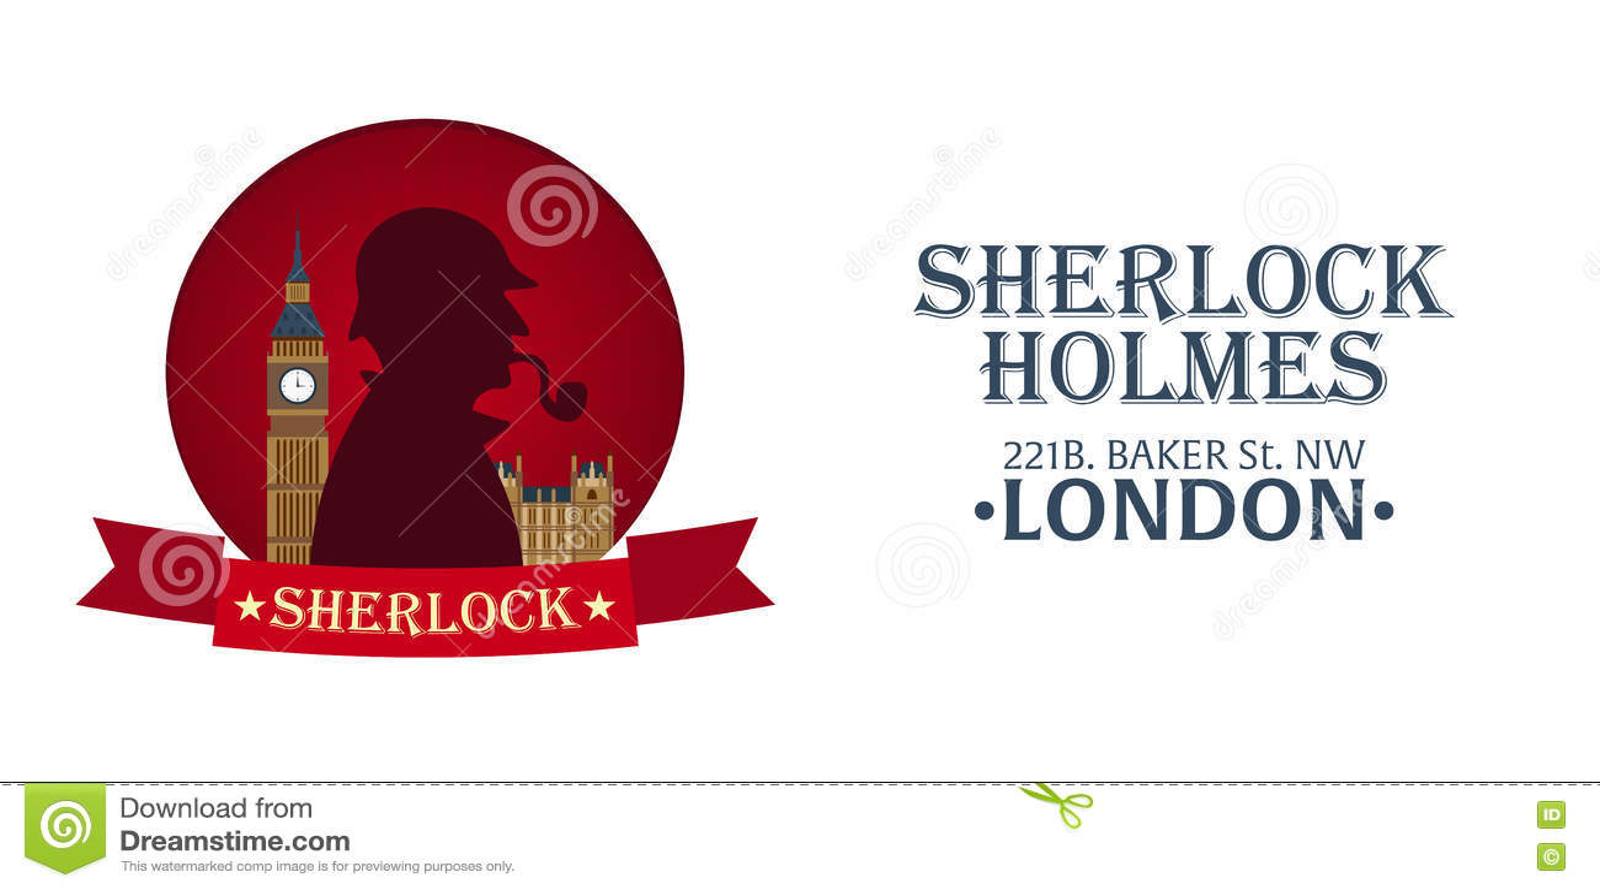 sherlock holmes plakat detektivillustration illustration mit sherlock holmes backerstrasse 221b london grosses verbot